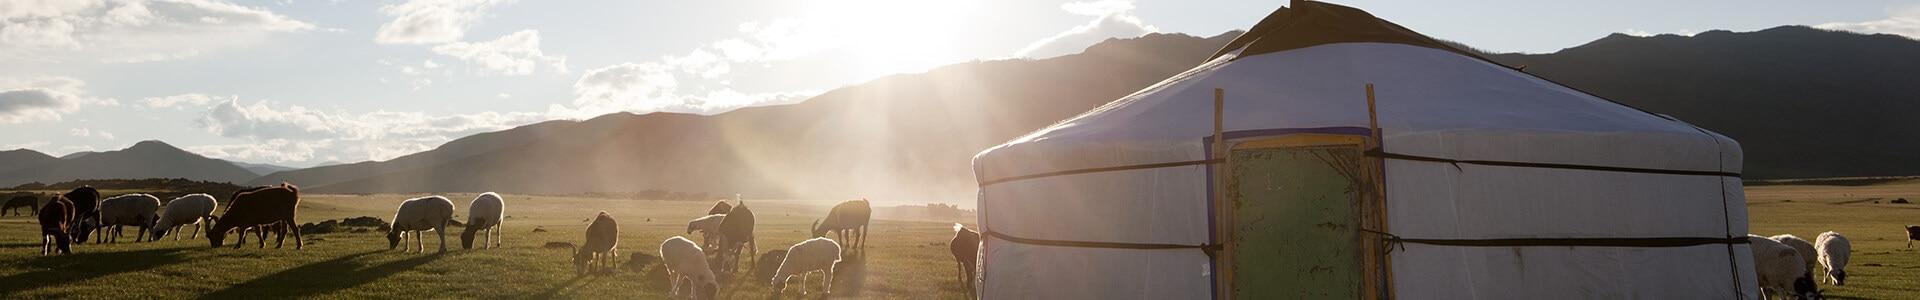 Voyage en Mongolie - TUI